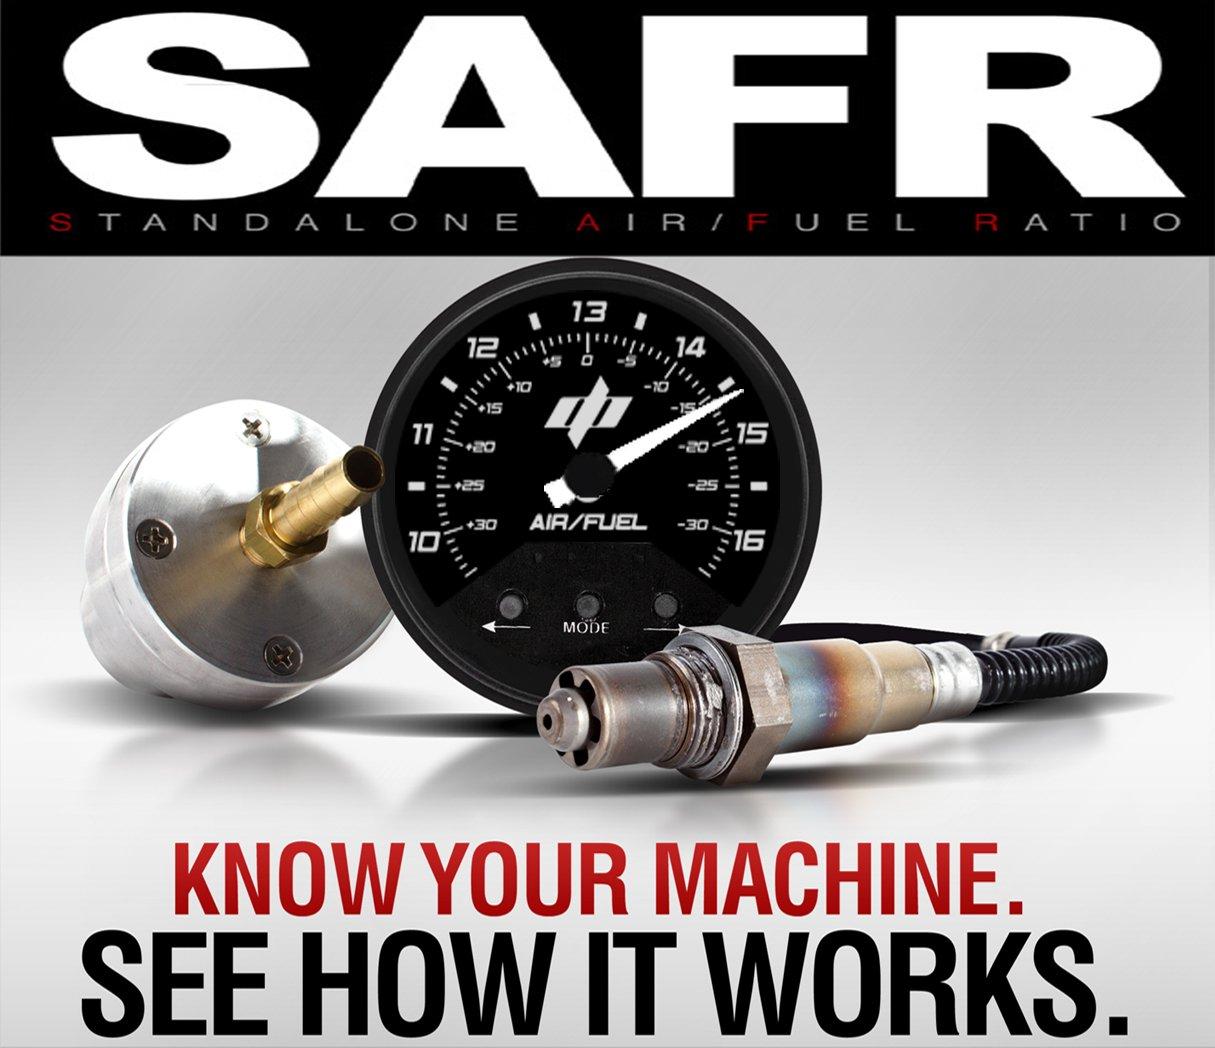 Dobeck Performance SAFR (Standalone Air/Fuel Ratio) Diagnostic Tool